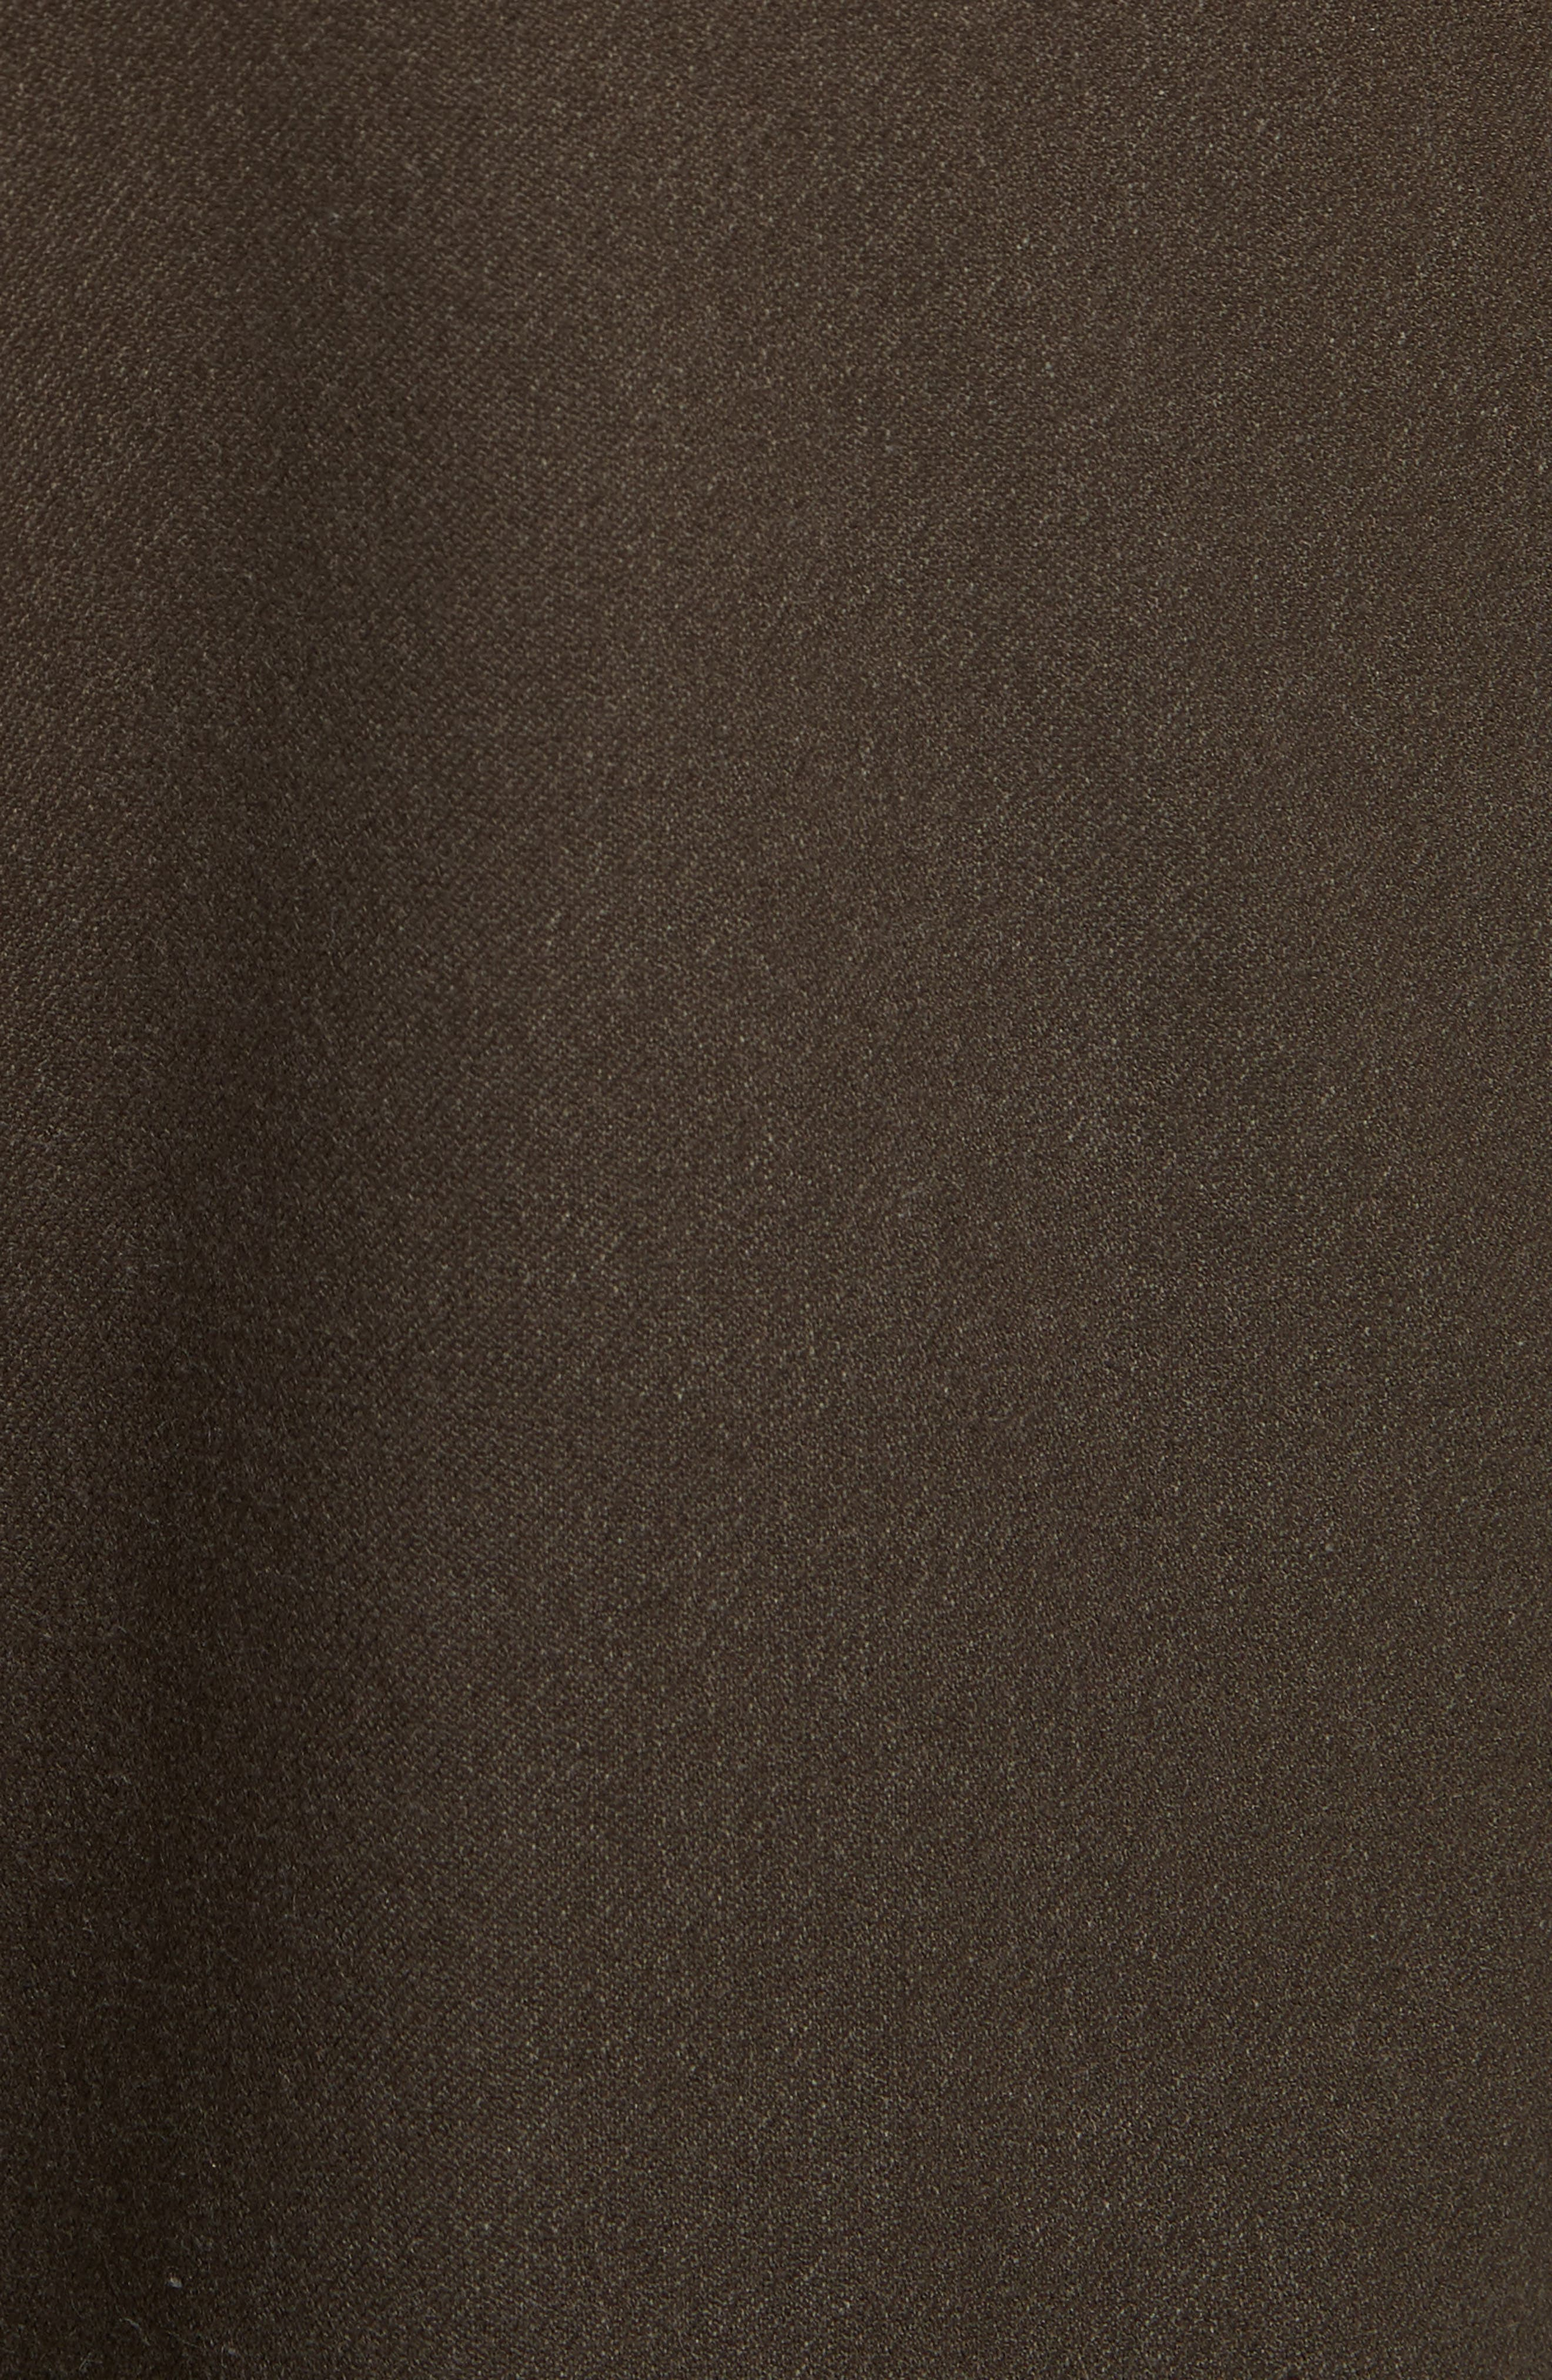 New Tony Gabardine Crop Pants,                             Alternate thumbnail 5, color,                             245